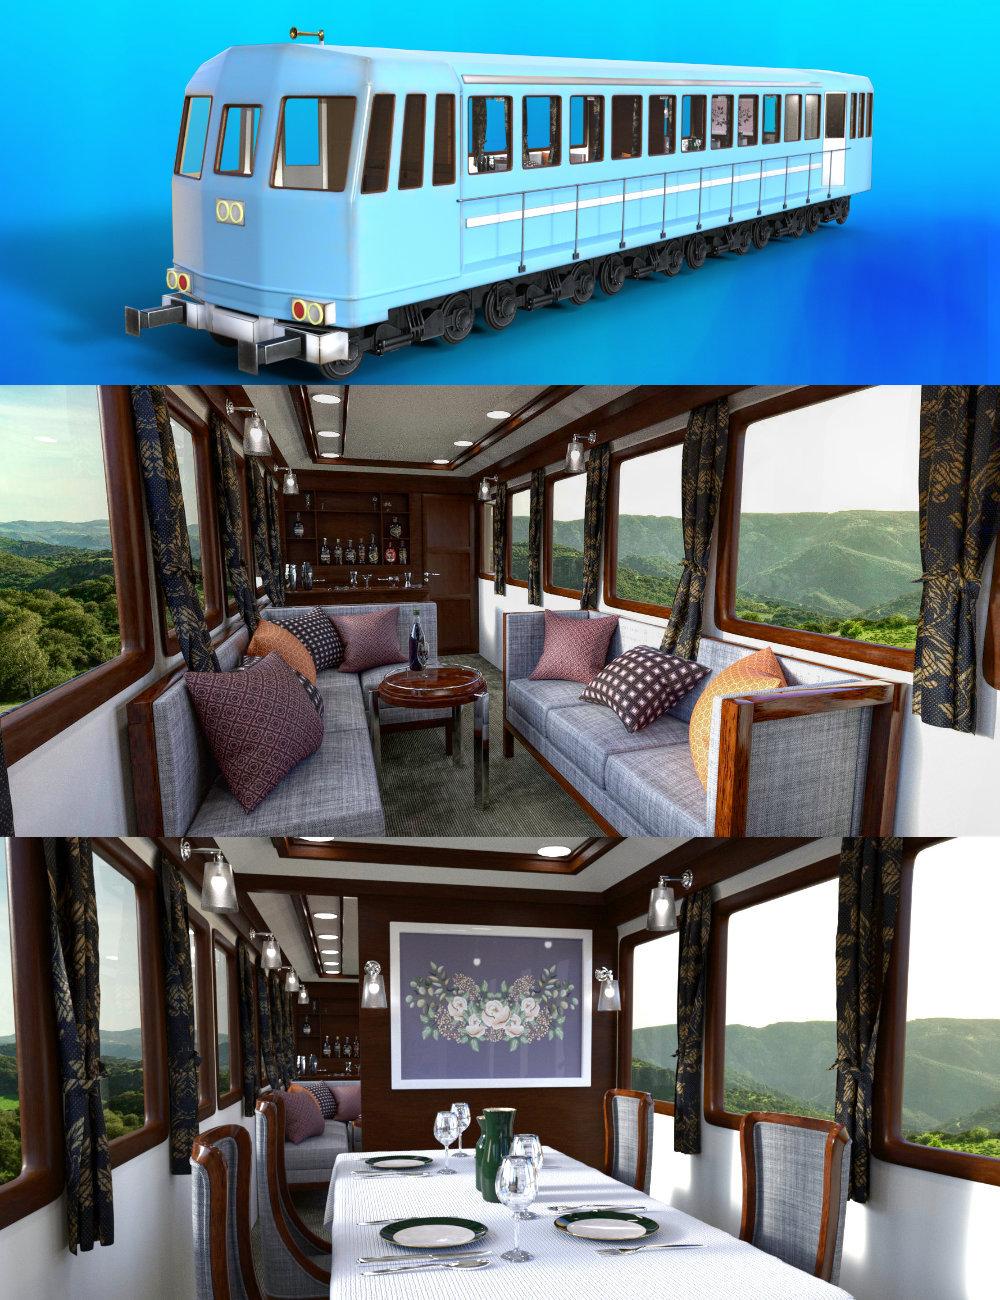 FG Luxury Passenger Train by: PAN StudiosFugazi1968ironman13, 3D Models by Daz 3D